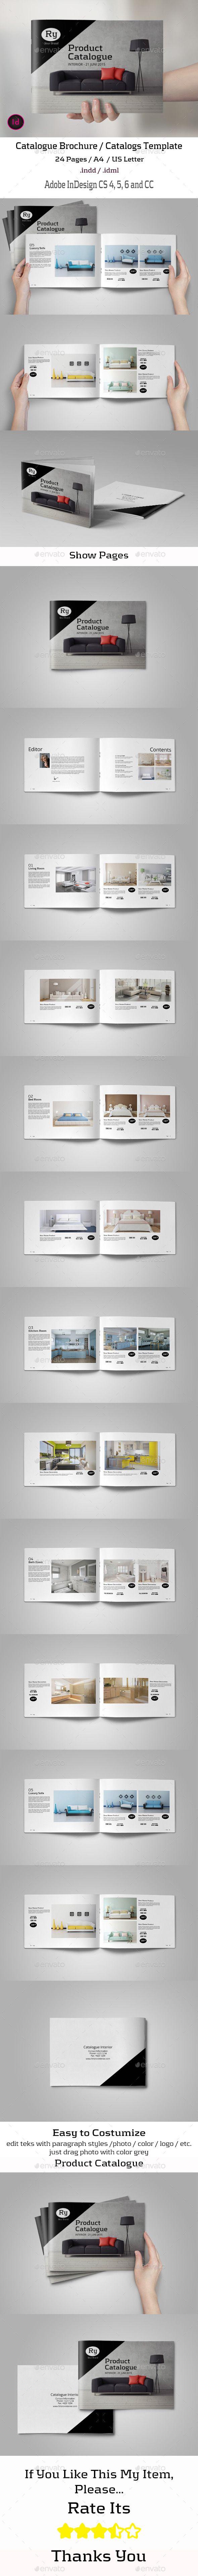 Catalog Interior Brochure Template #brochure Download: http://graphicriver.net/item/catalog-interior/11558127?ref=ksioks